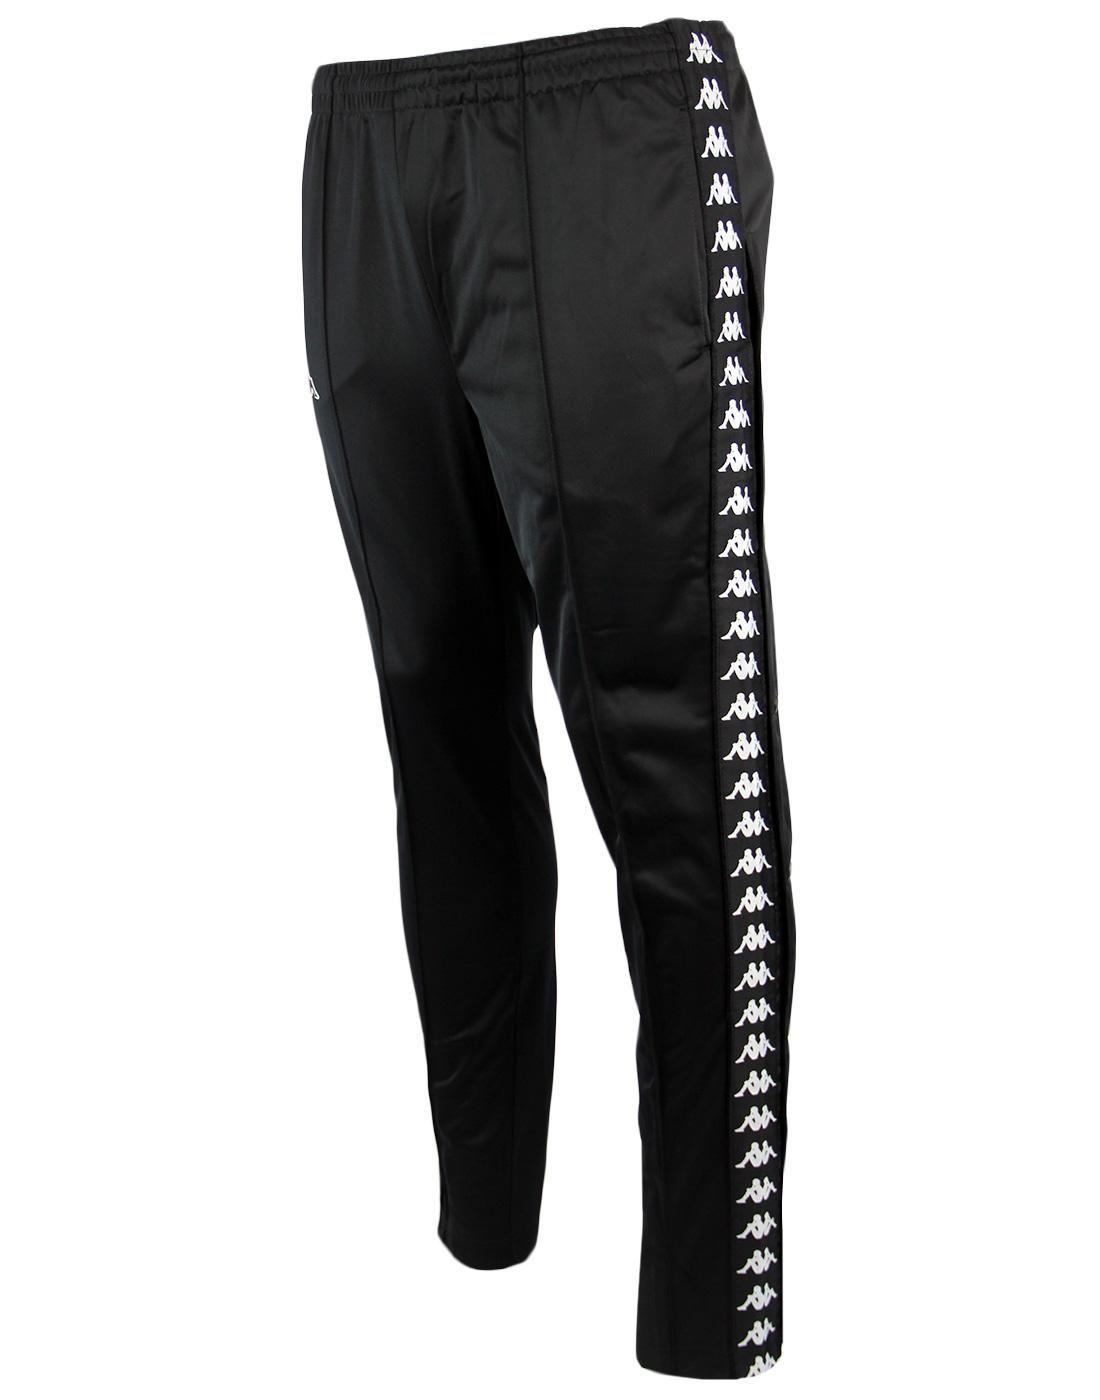 9f936a7c Banda Astoria KAPPA Men's Retro Snap Track Pants | Style | Tracksuit ...